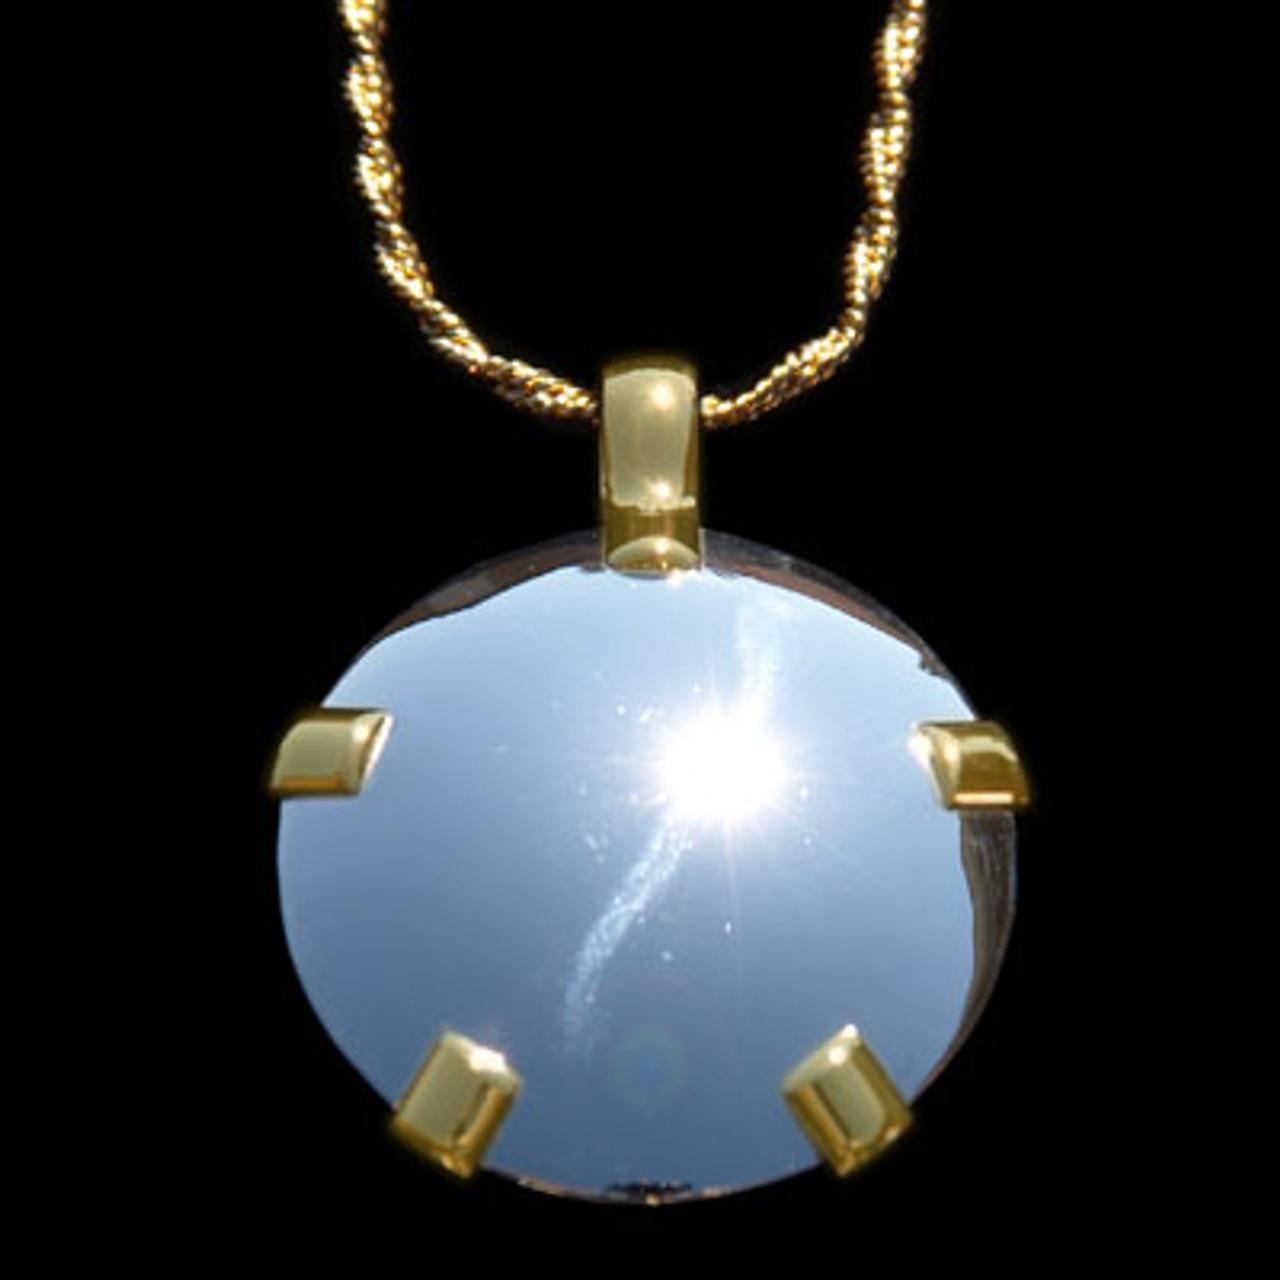 LEVEL 3 BioElectric Shield Sterling Silver w/14K Gold Tabs Shield - Polished